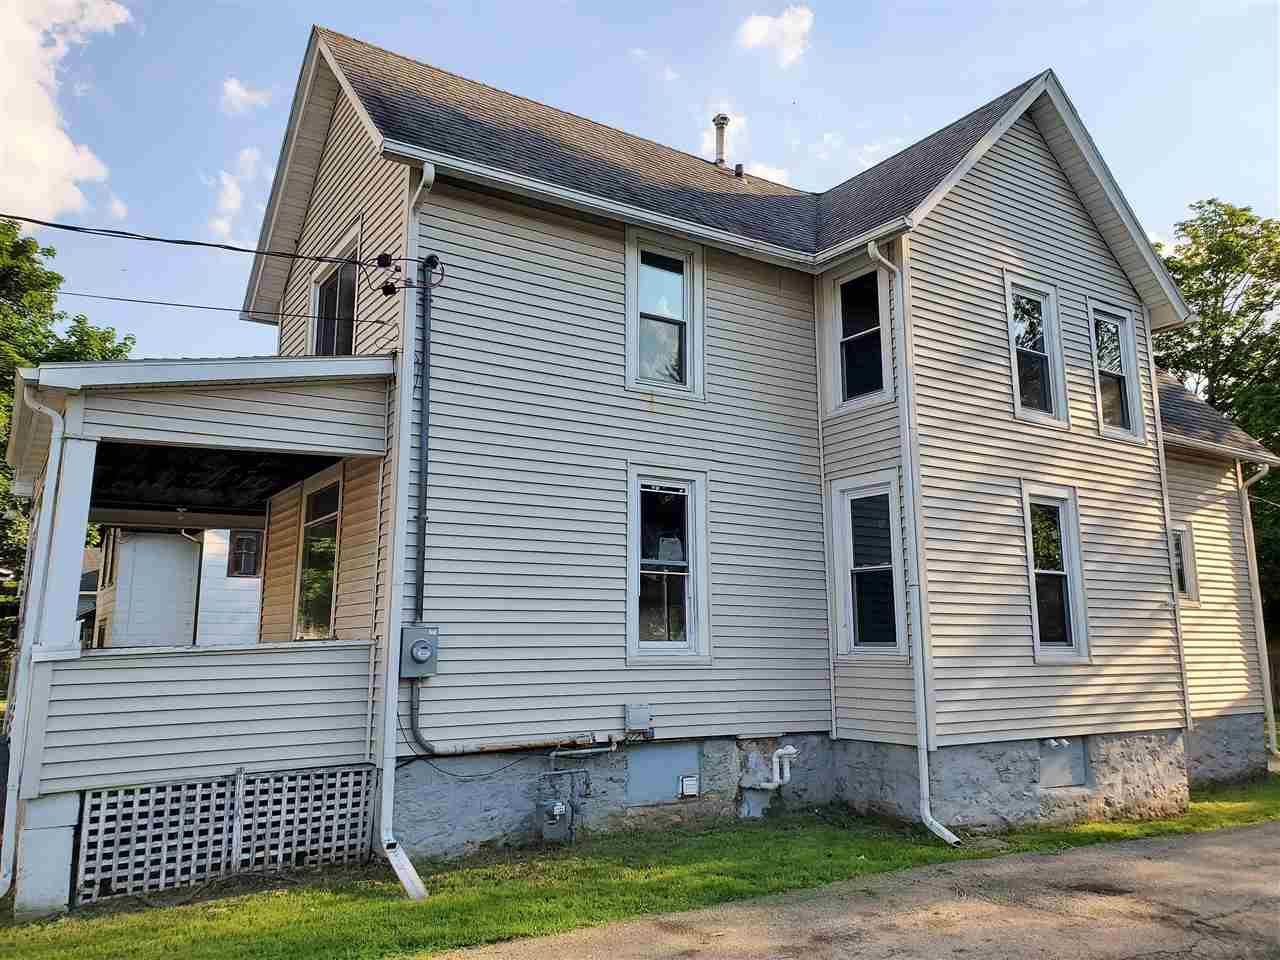 223 N Pearl St, Janesville, WI 53548 - #: 1911615